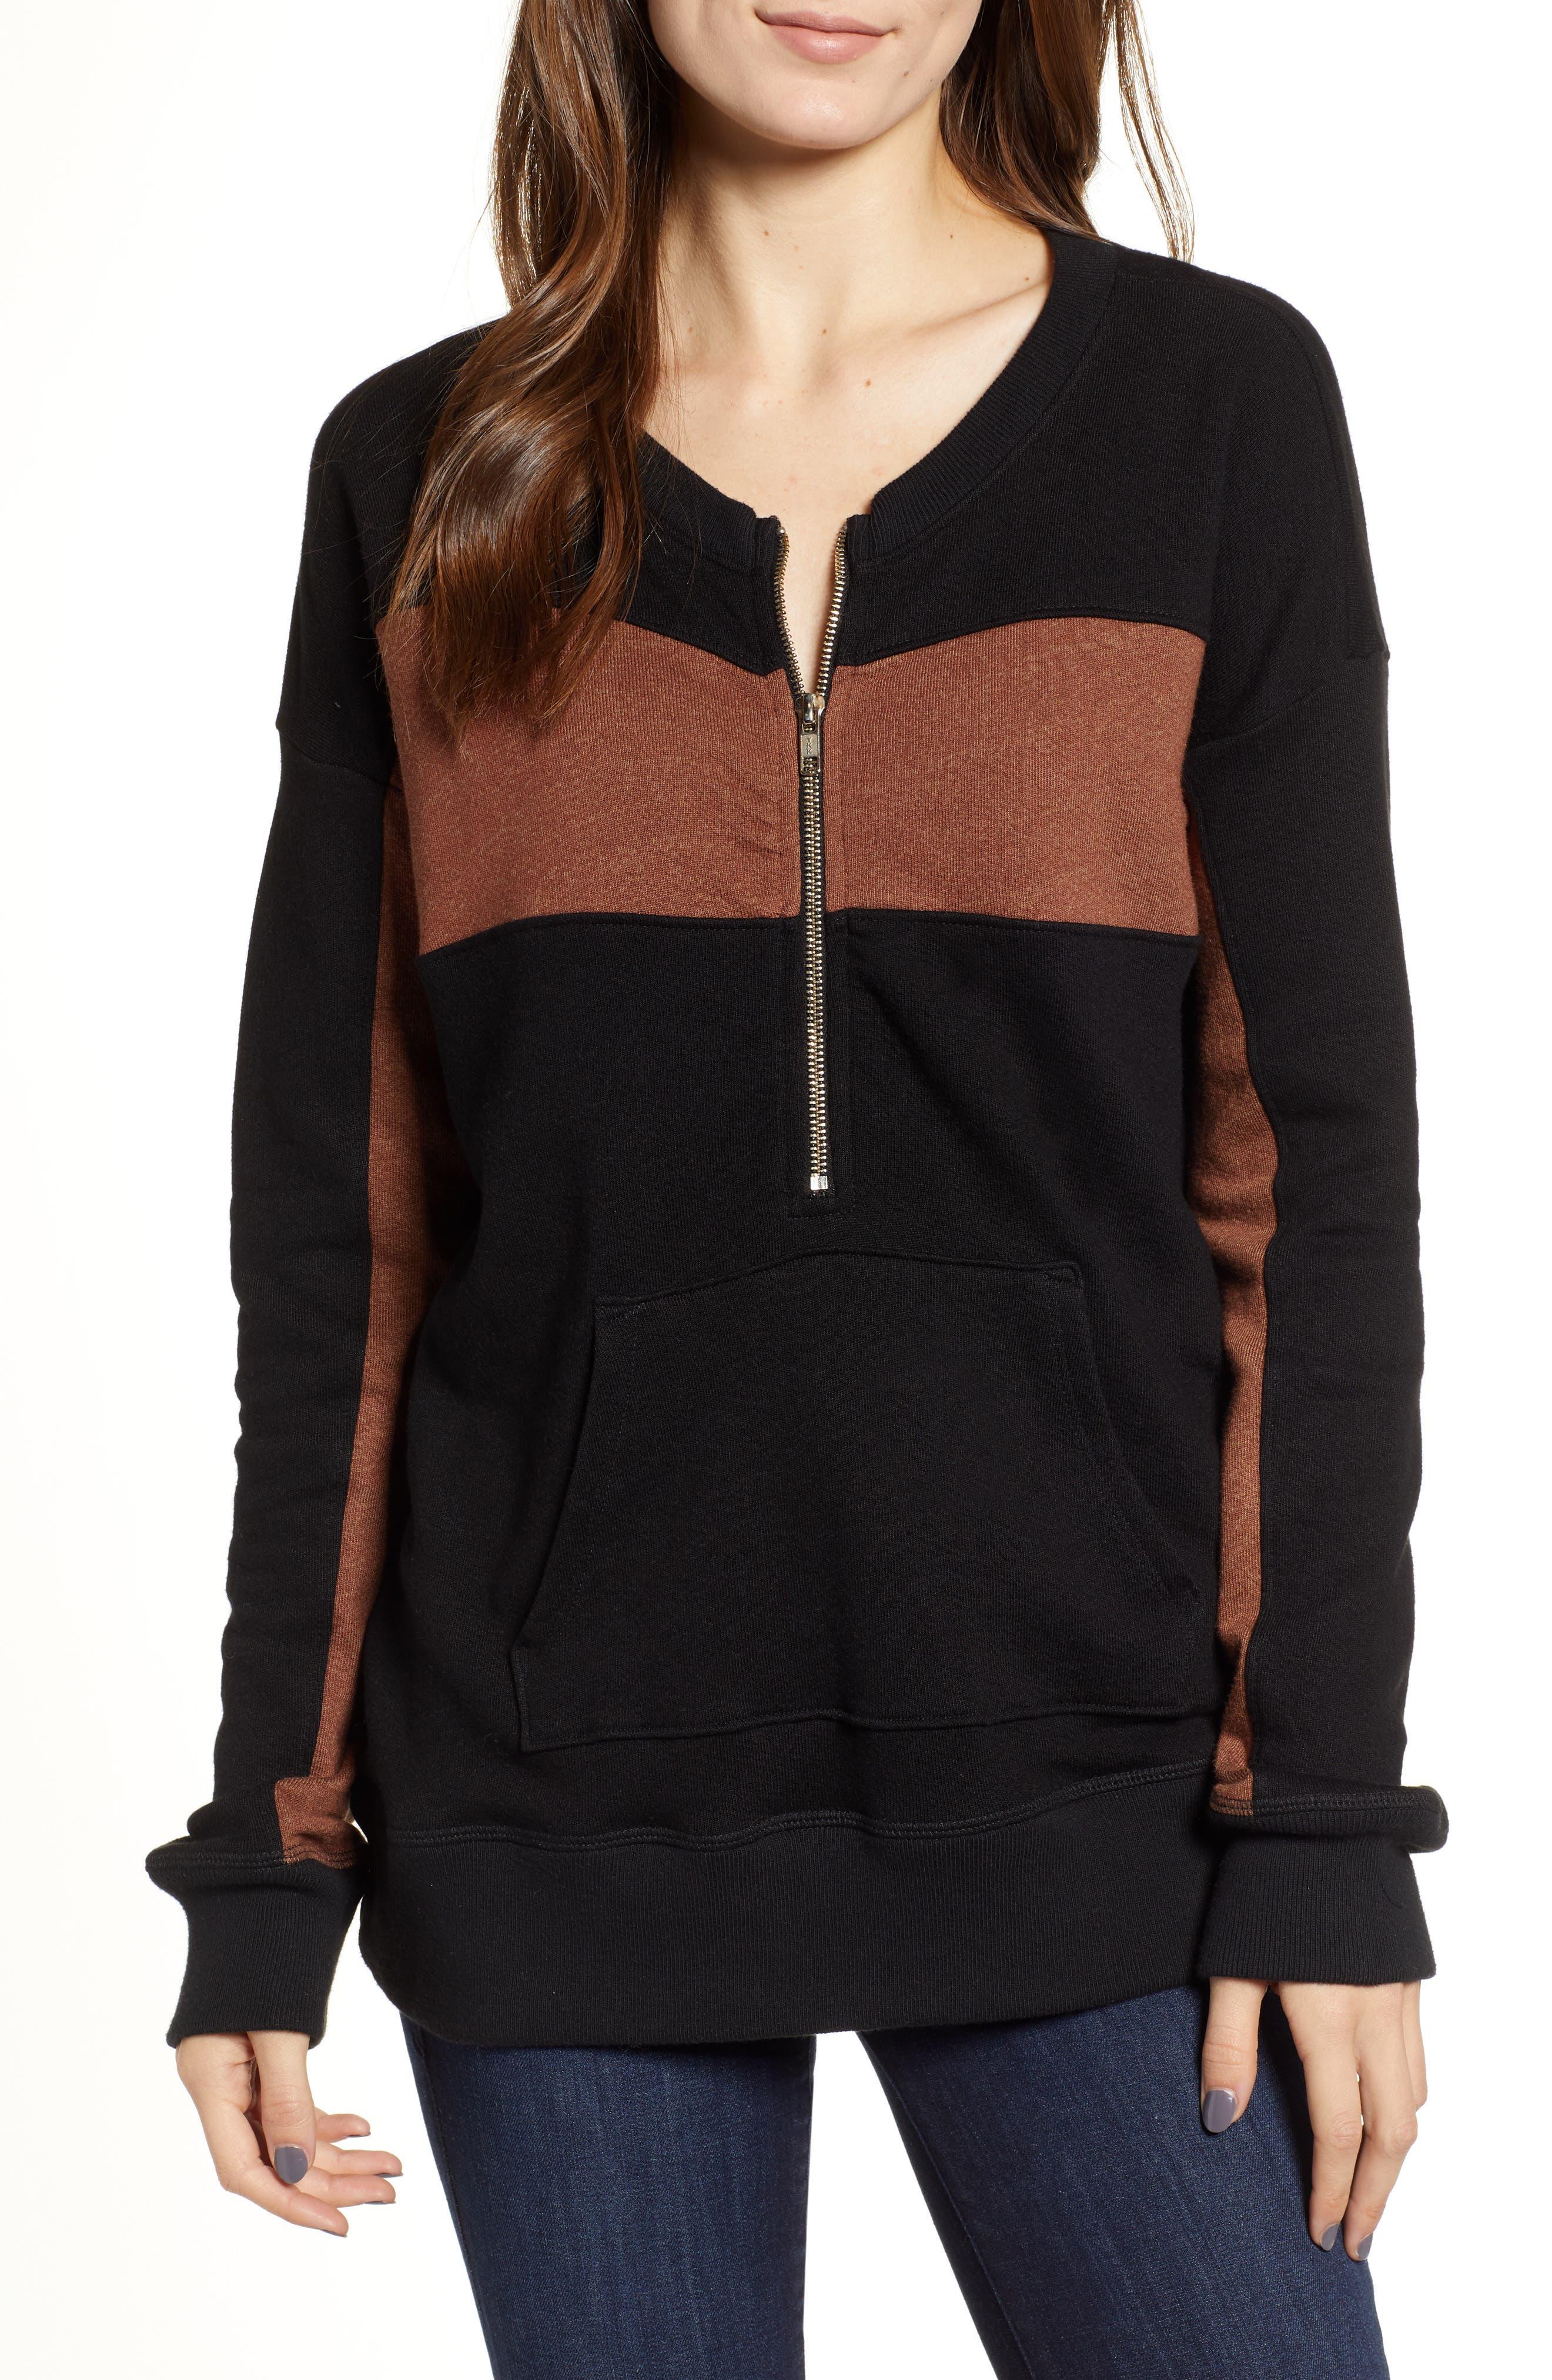 N:philanthropy Stripe Quarter Zip Sweatshirt, Black